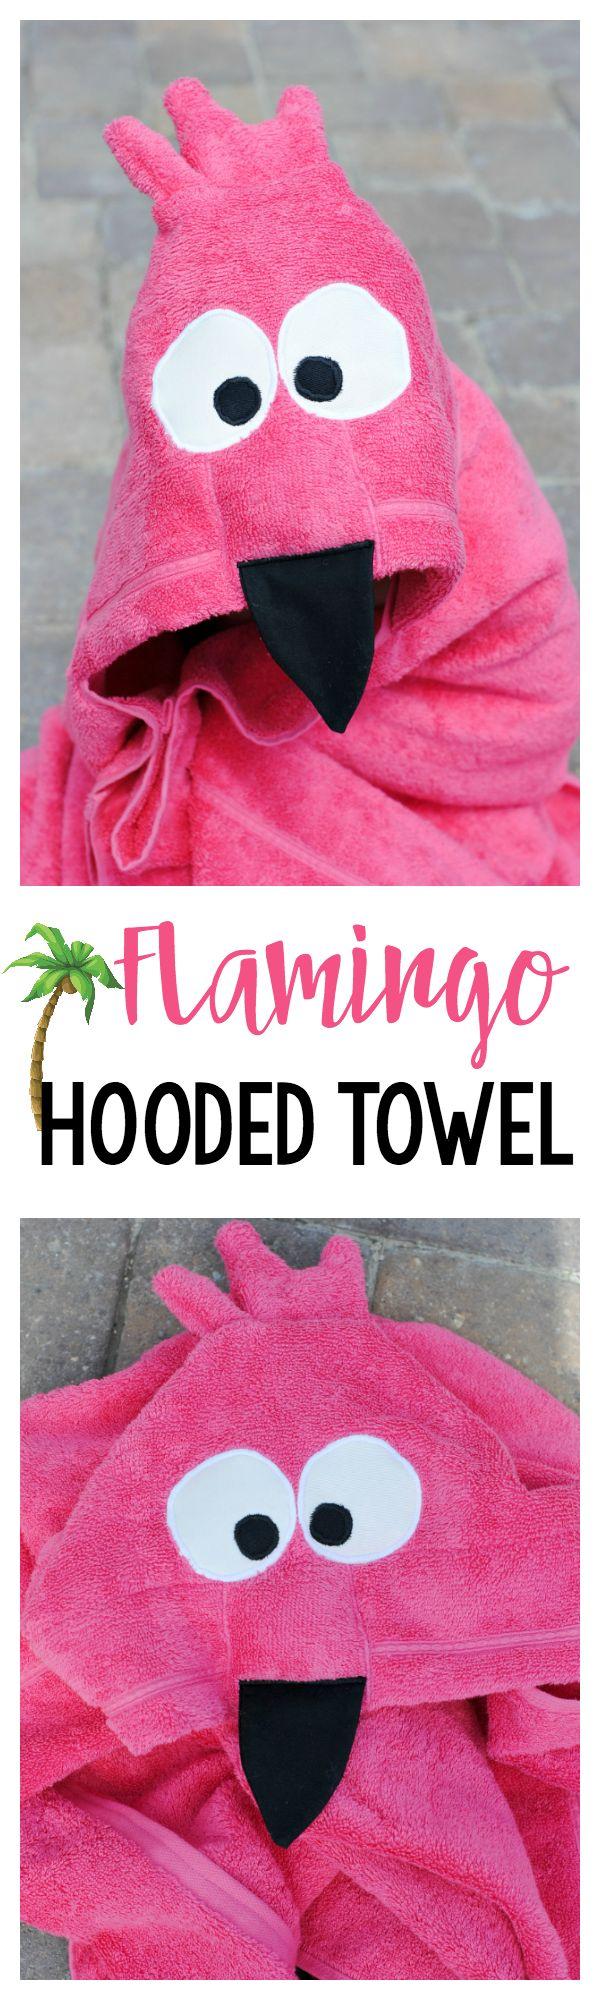 Baby flamingo car interior design - Flamingo Hooded Towel Pattern